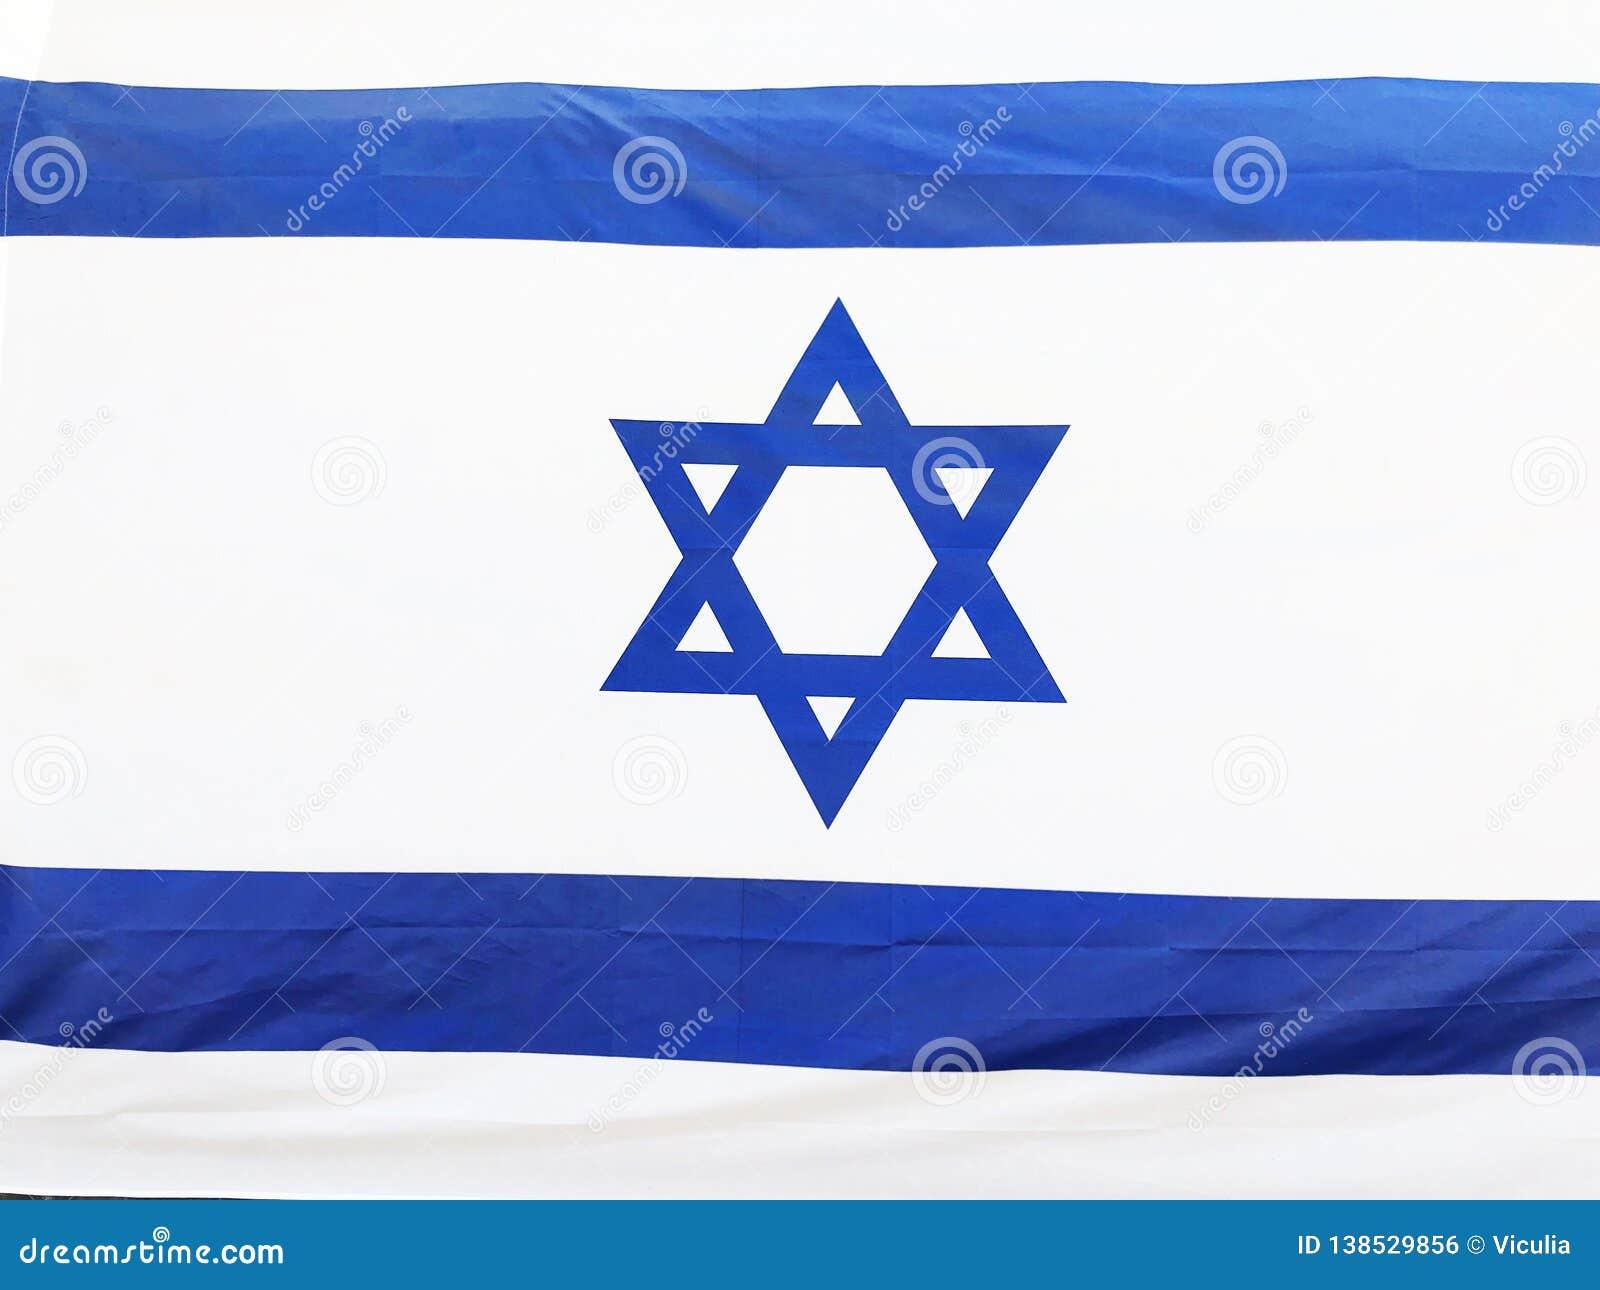 RISHON LE ZION IZRAEL, Czerwiec, - 27, 2018 Izrael flaga państowowa w Rishon Le Zion, Izrael